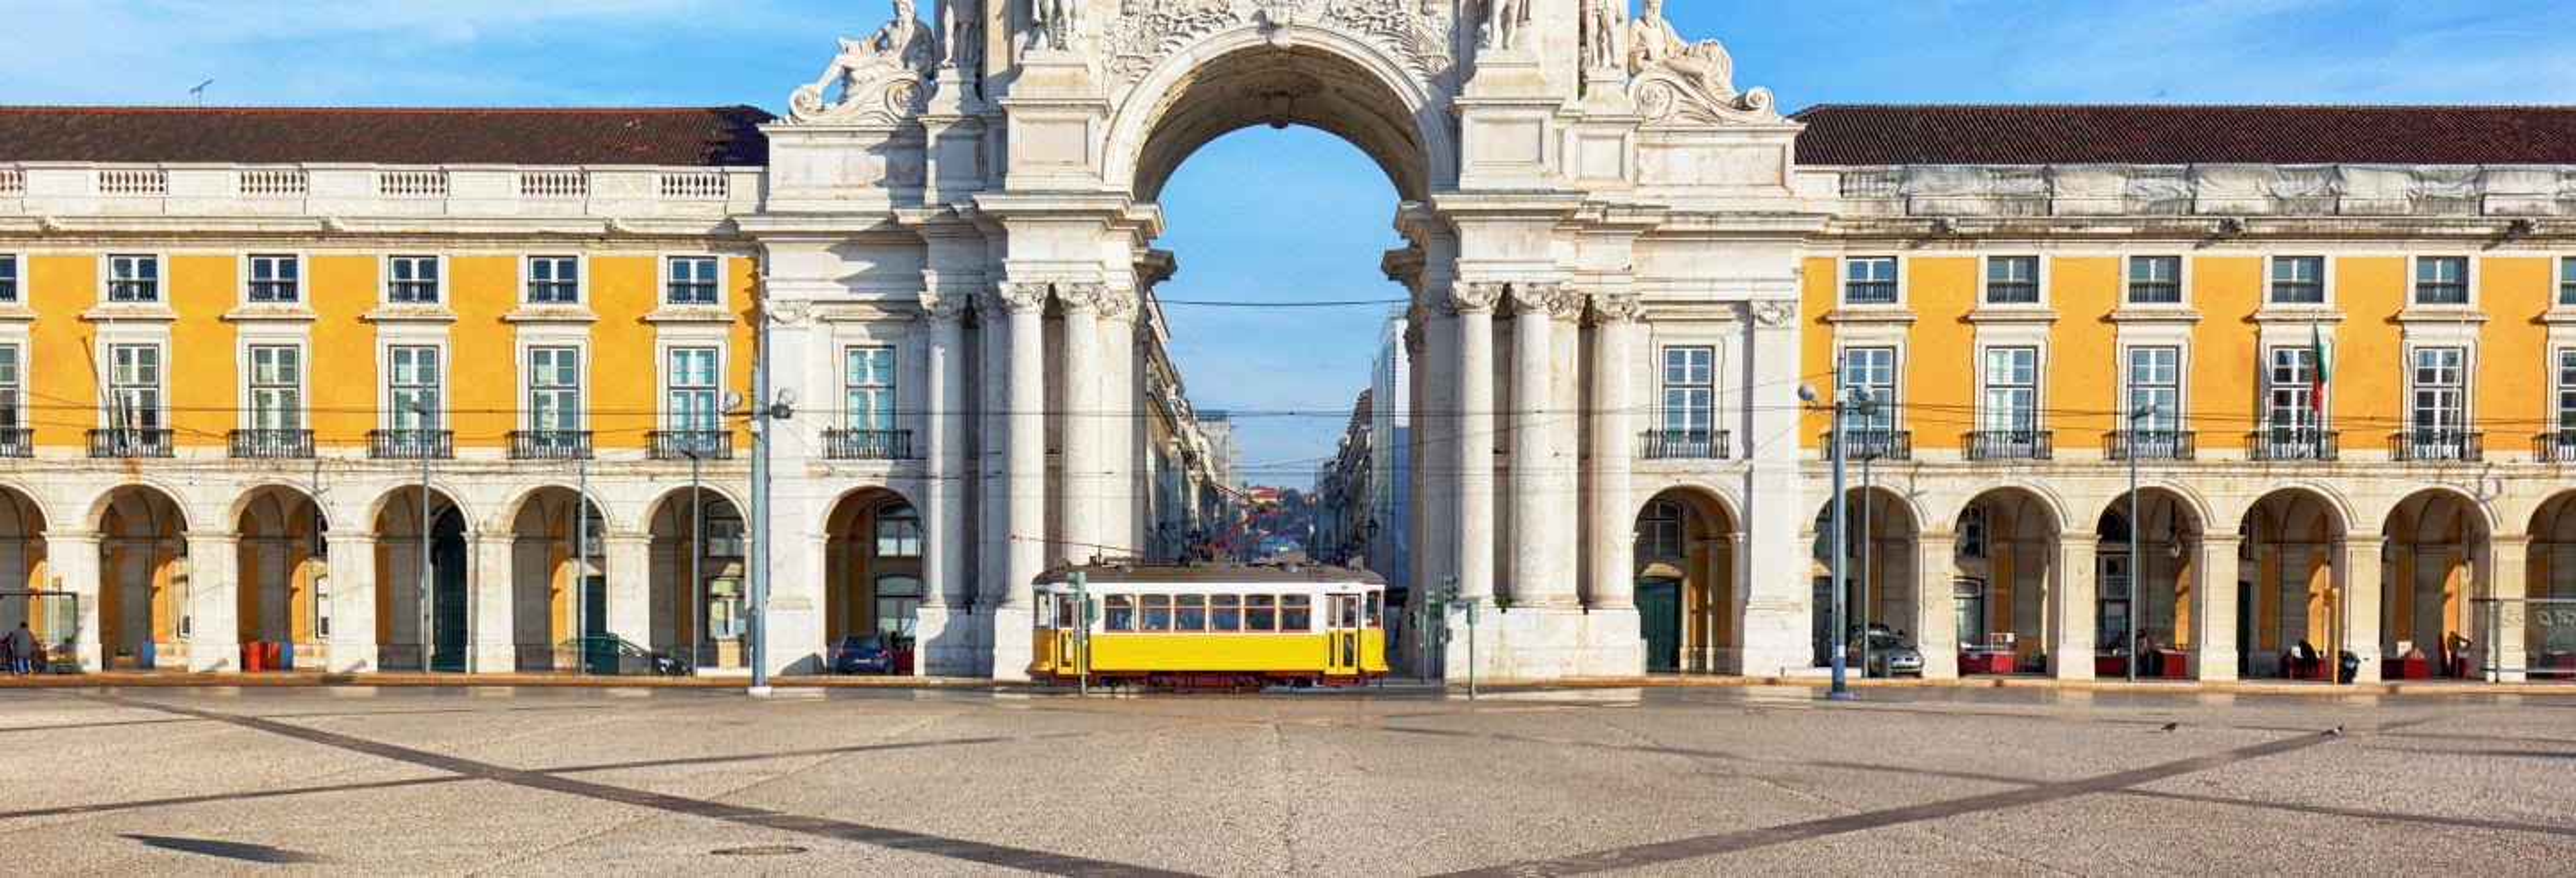 Lisbon Layover Tour